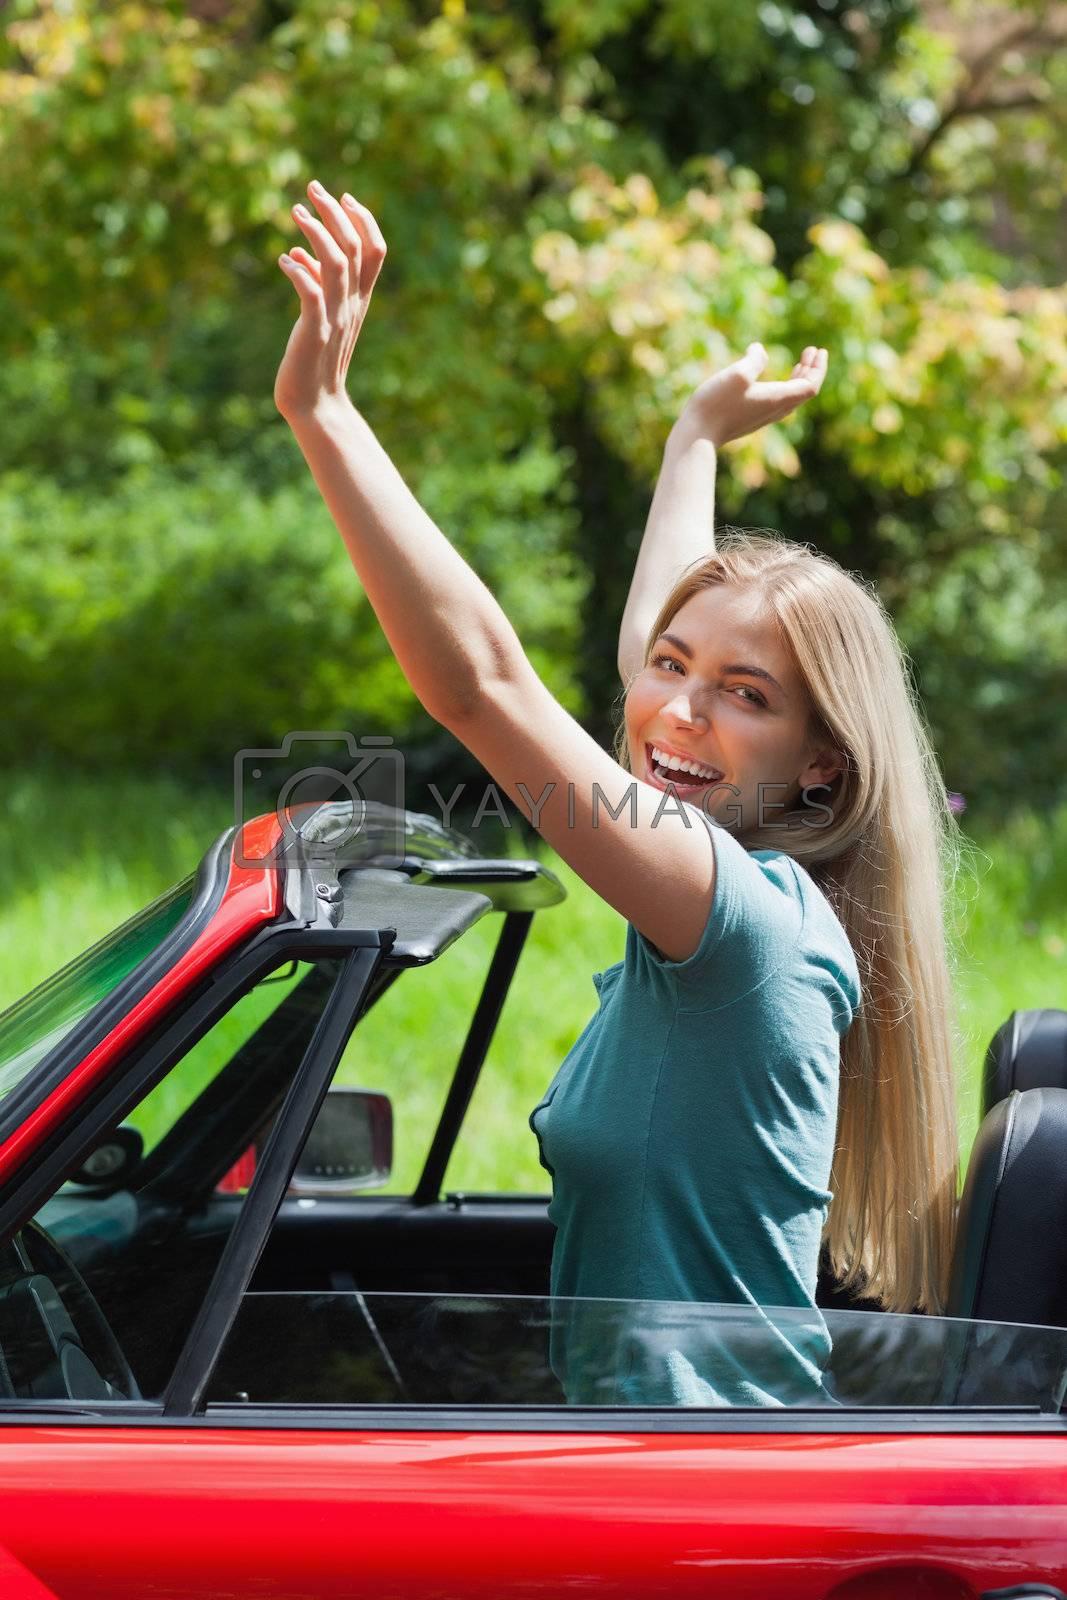 Smiling blonde enjoying her red cabriolet by Wavebreakmedia